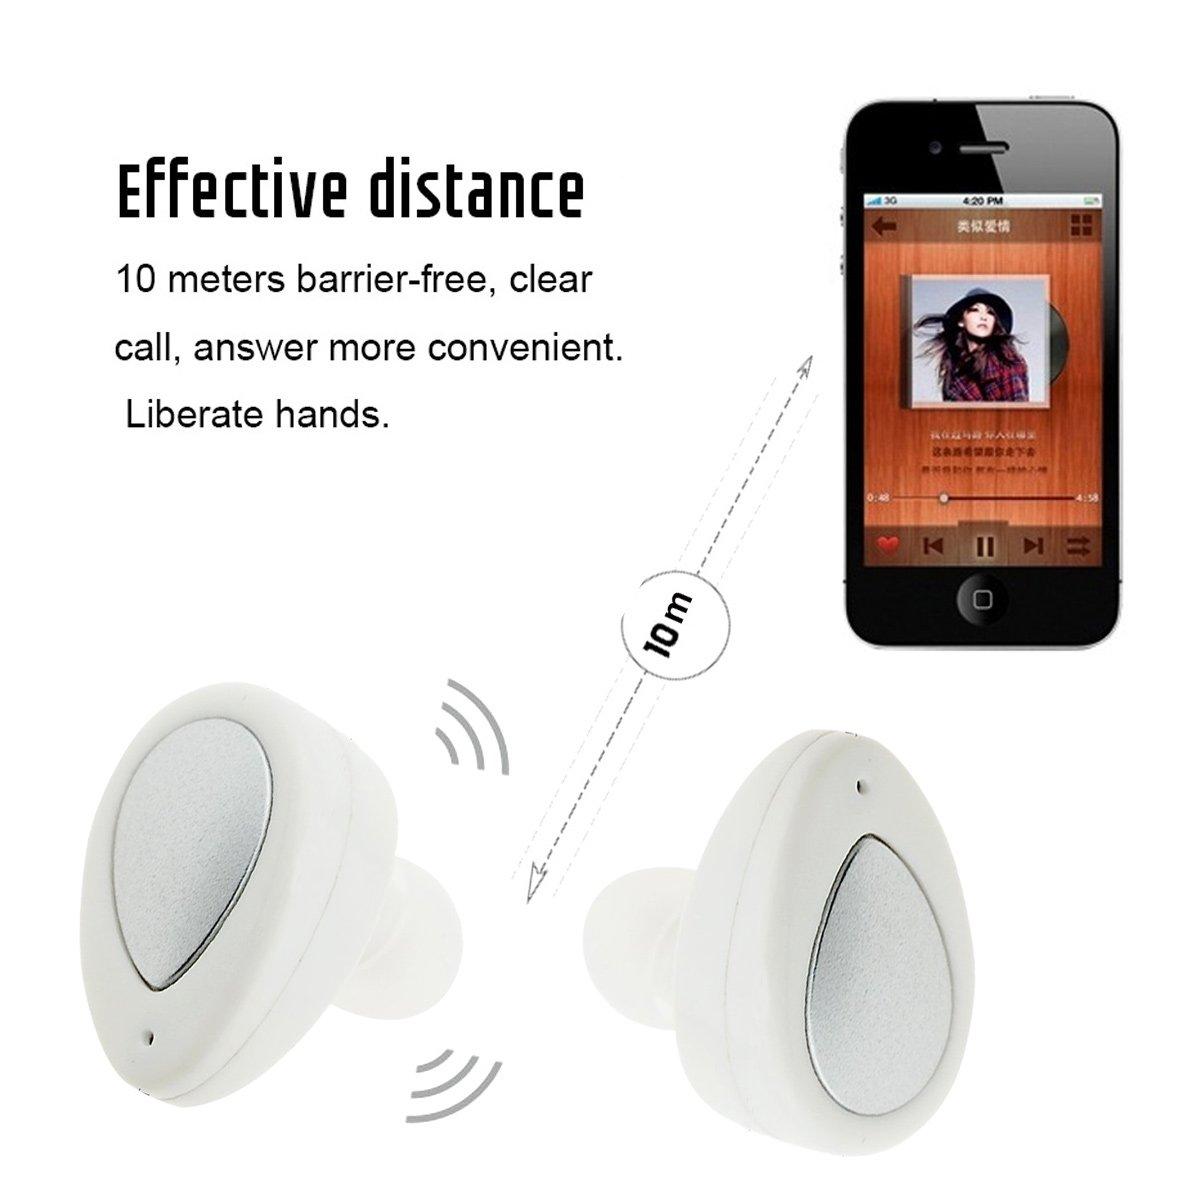 Mini Bluetooth Auricular,Dokpav® TWS-K2 Bluetooth V4.1 Gemelos estéreo Headset Headphone manos libres estéreo Auriculares Con caja de carga para iOS ...